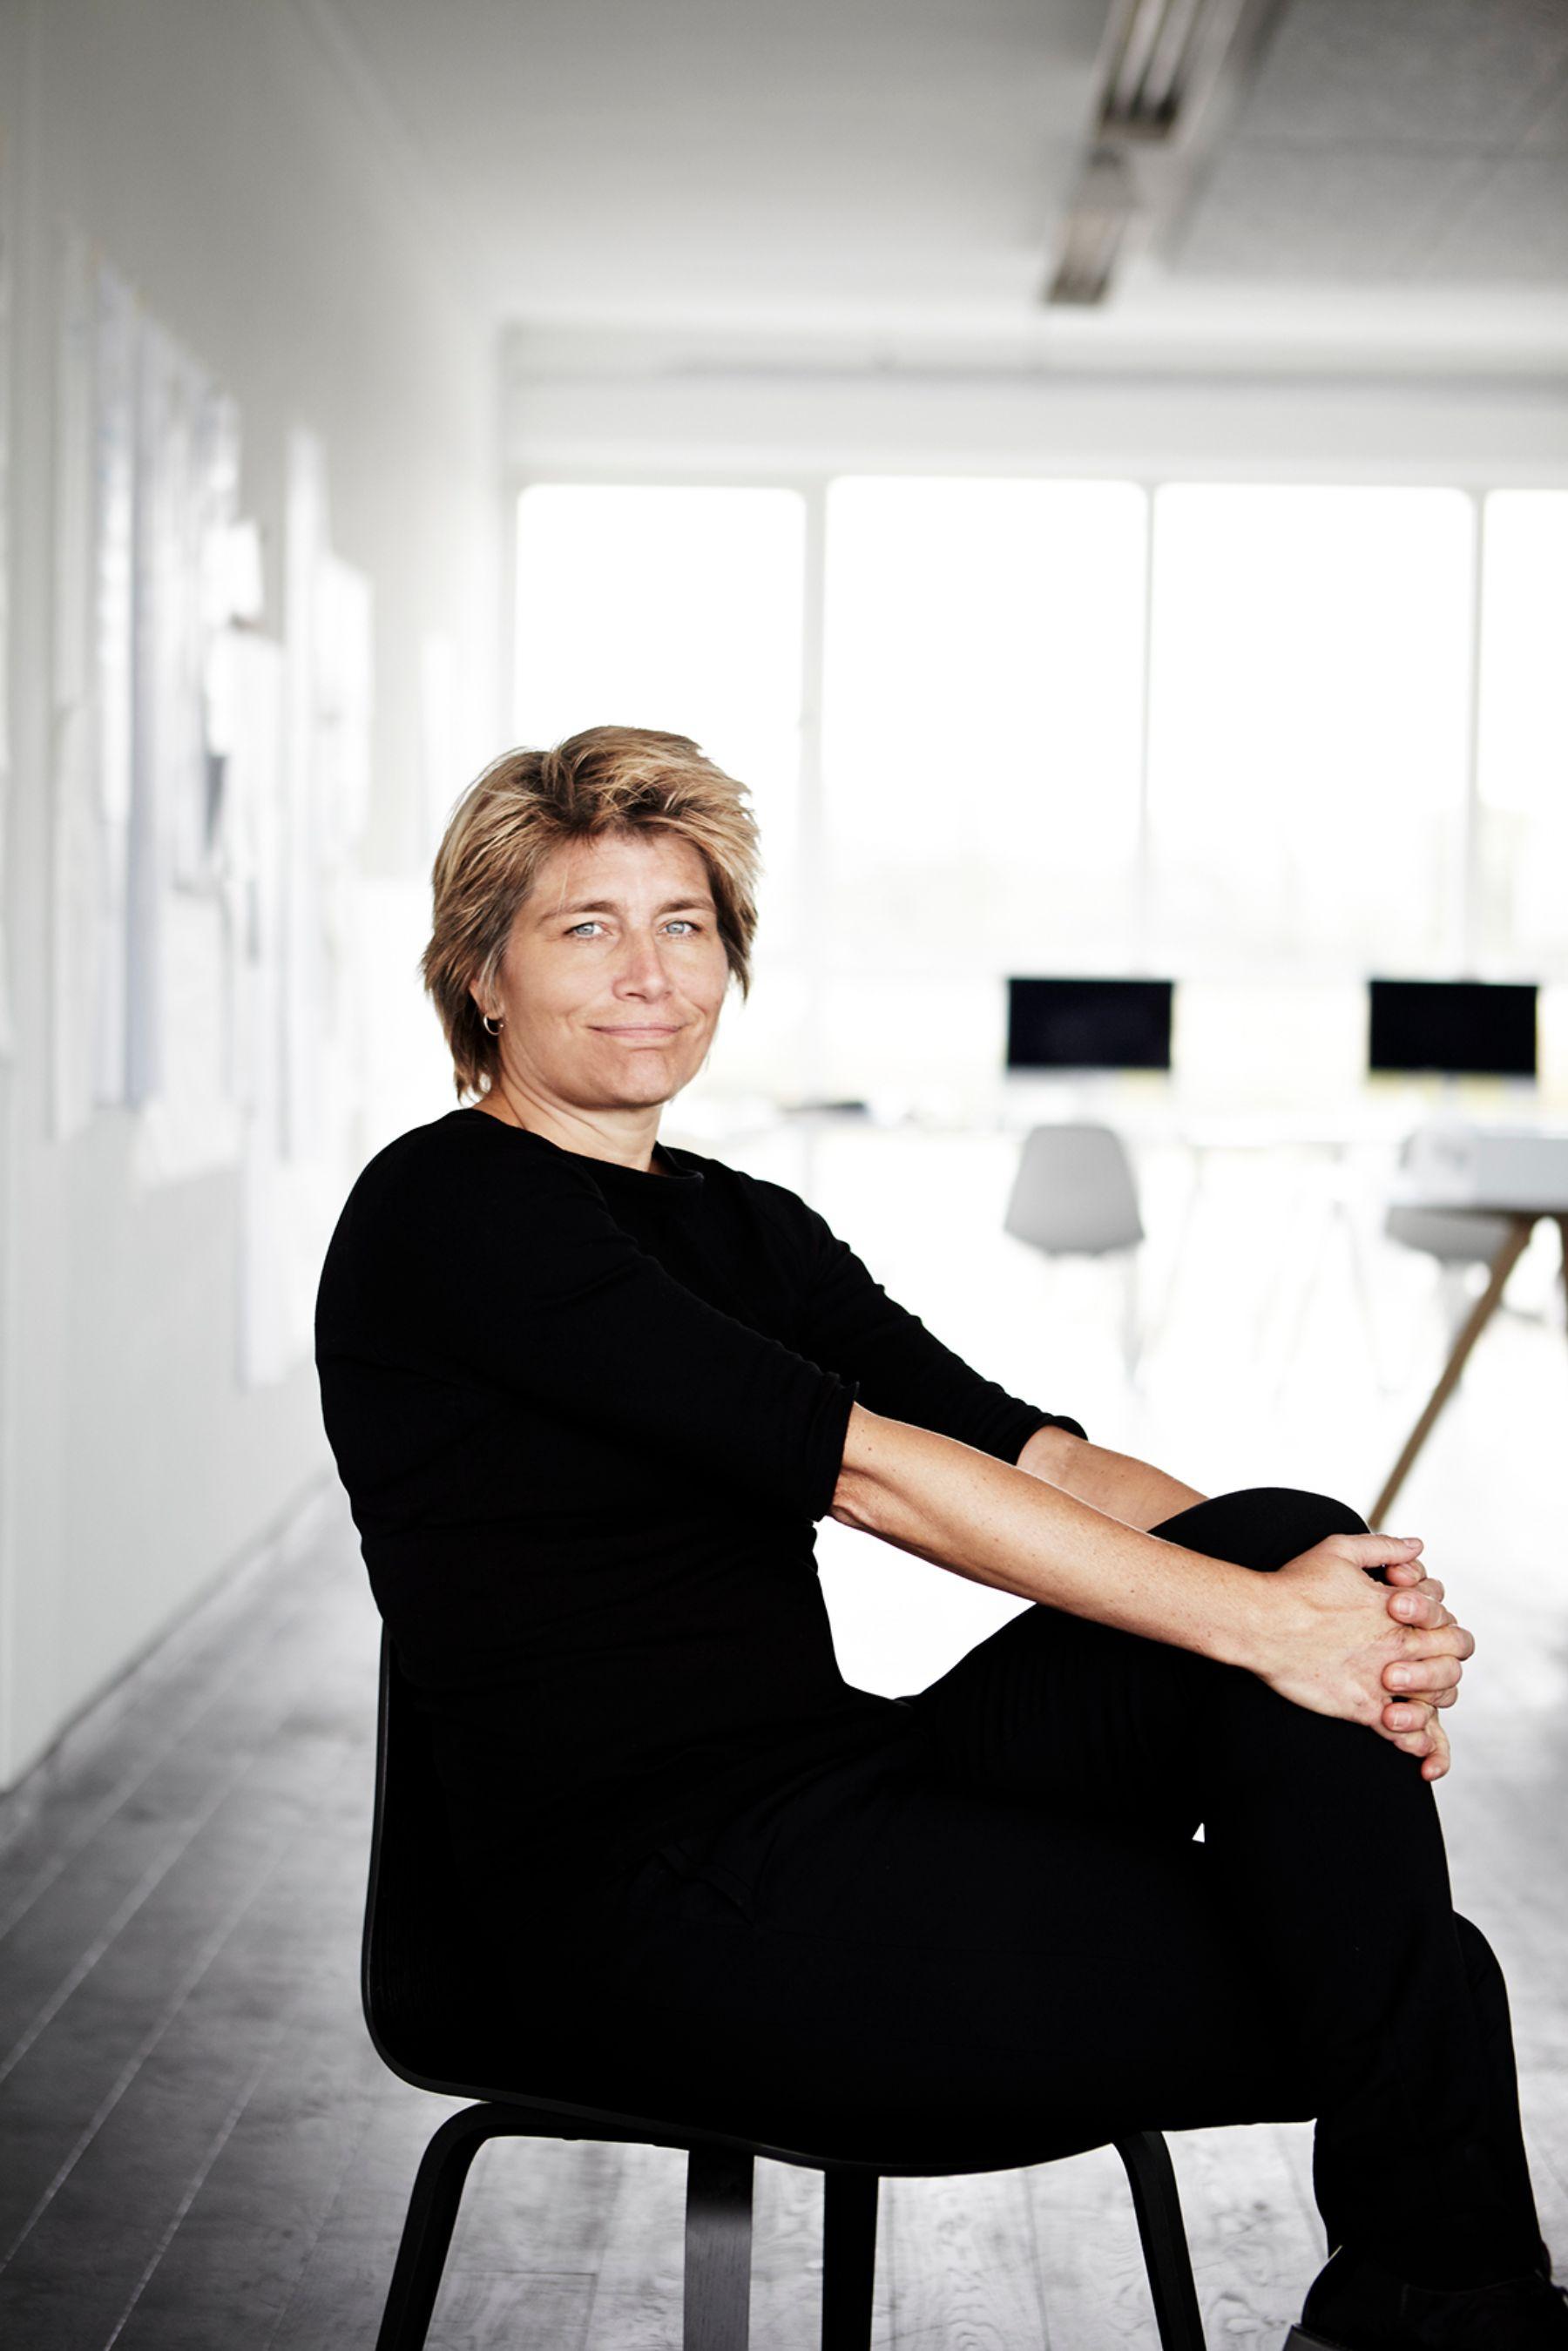 Rosan Bosch — At the Crossroads of Creativity